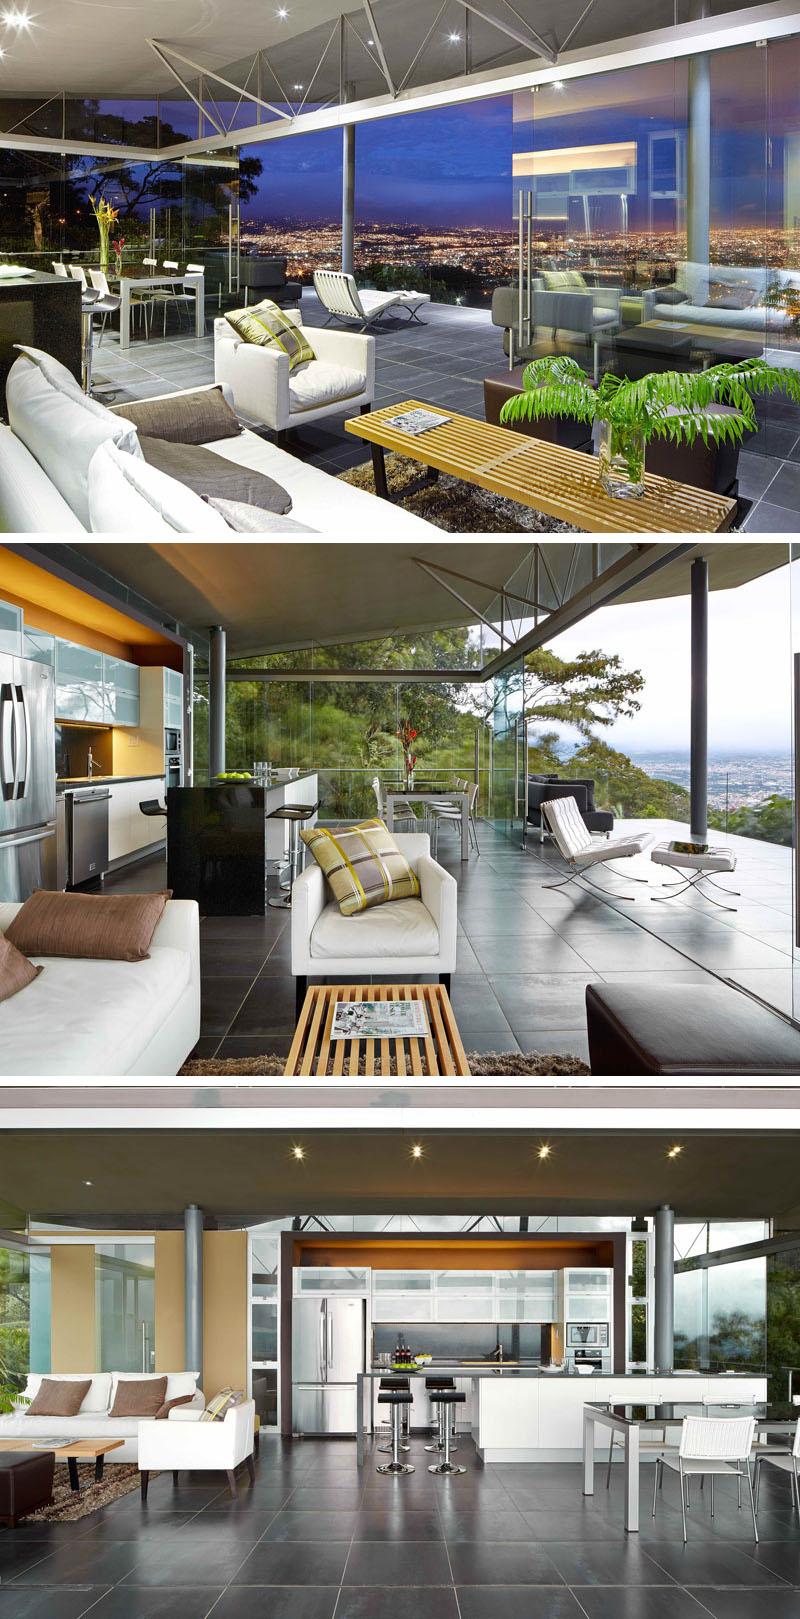 fachada-de-vidro-casa-suspensa-em-san-jose-costa-rica